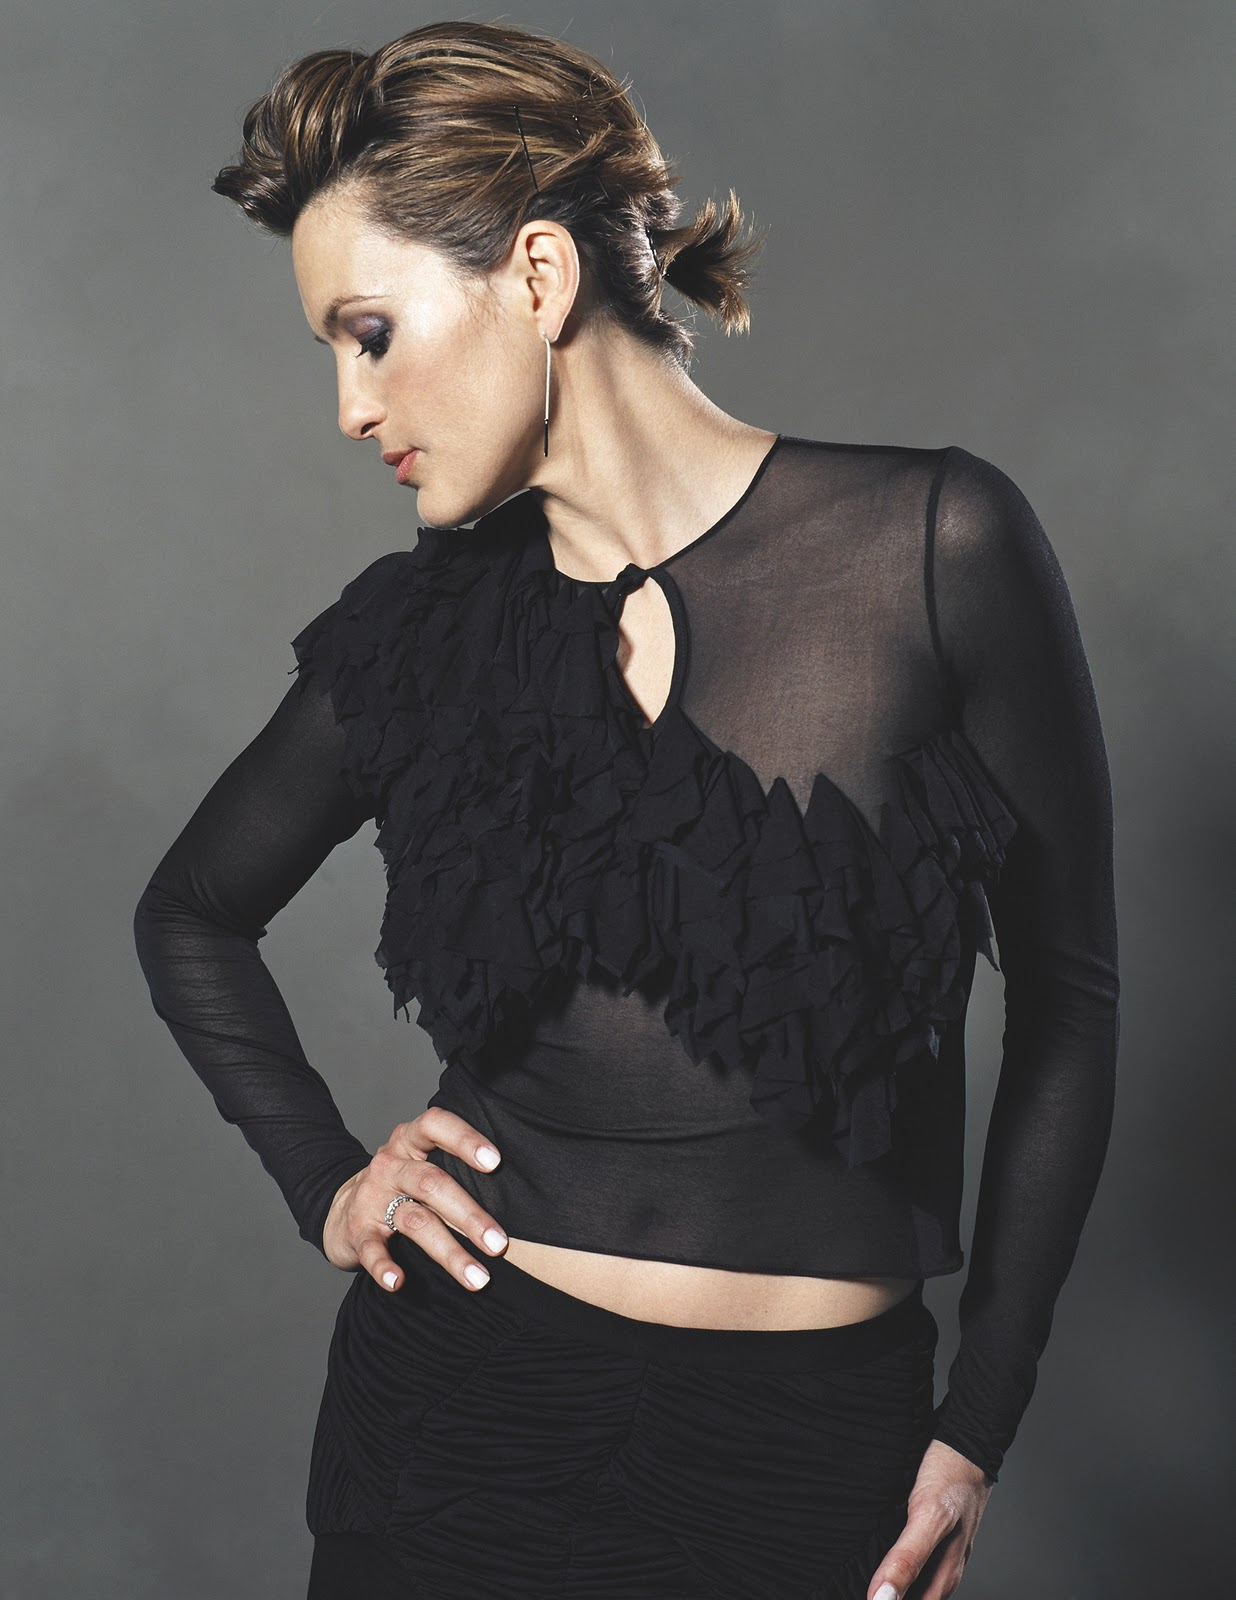 Mariska Hargitay Haircut Short Hairstyle 2013